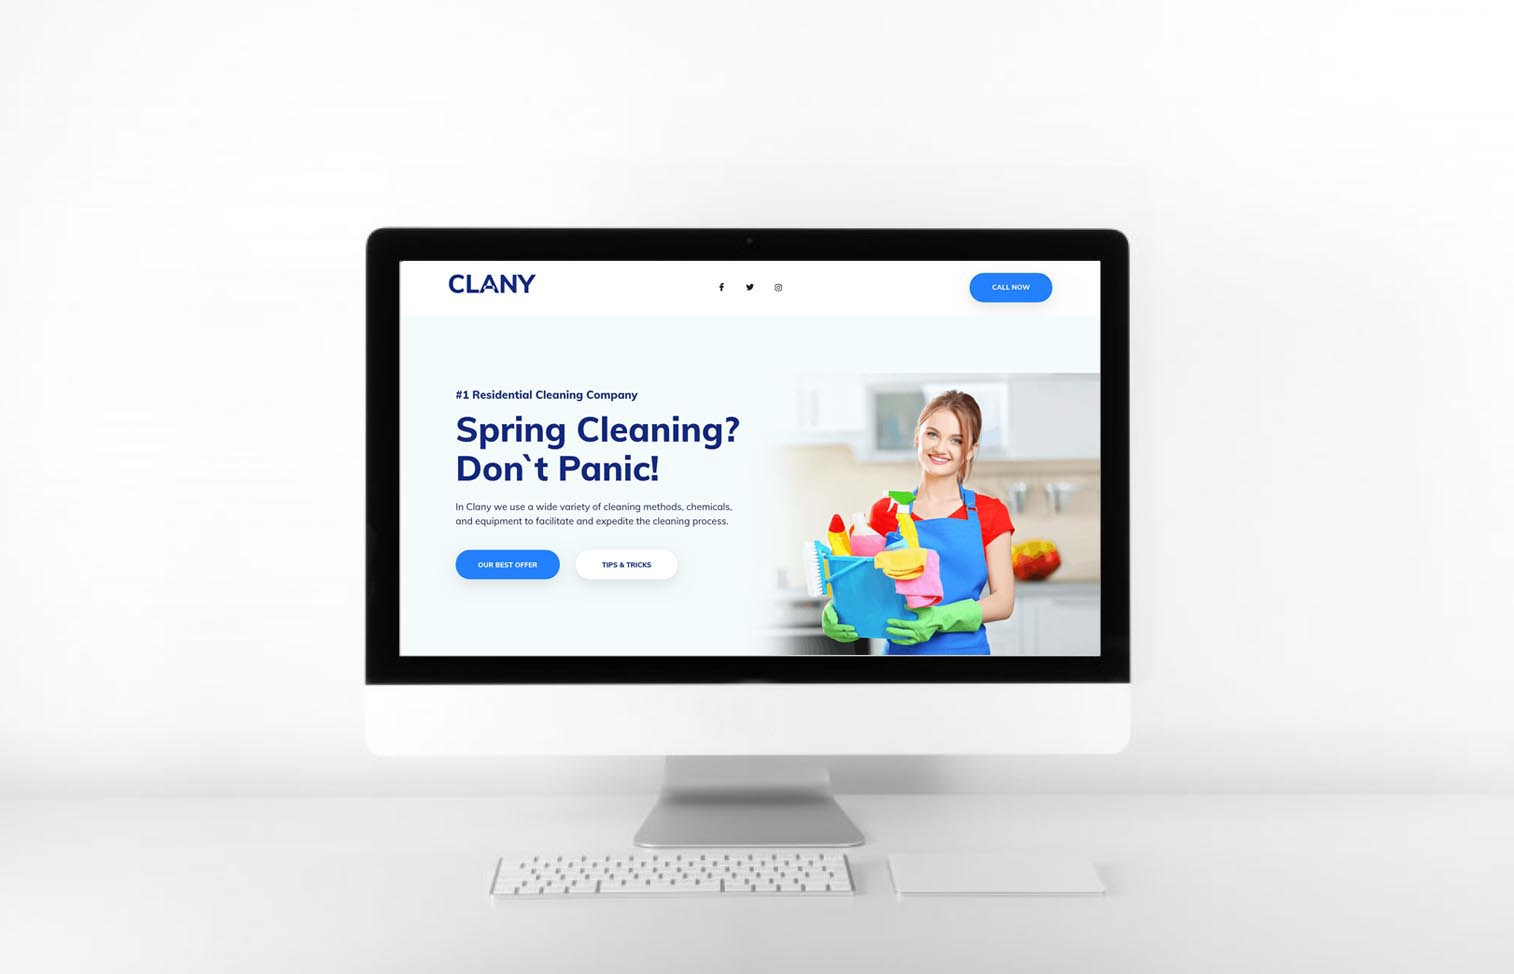 desktop-clany-website-design-company-2